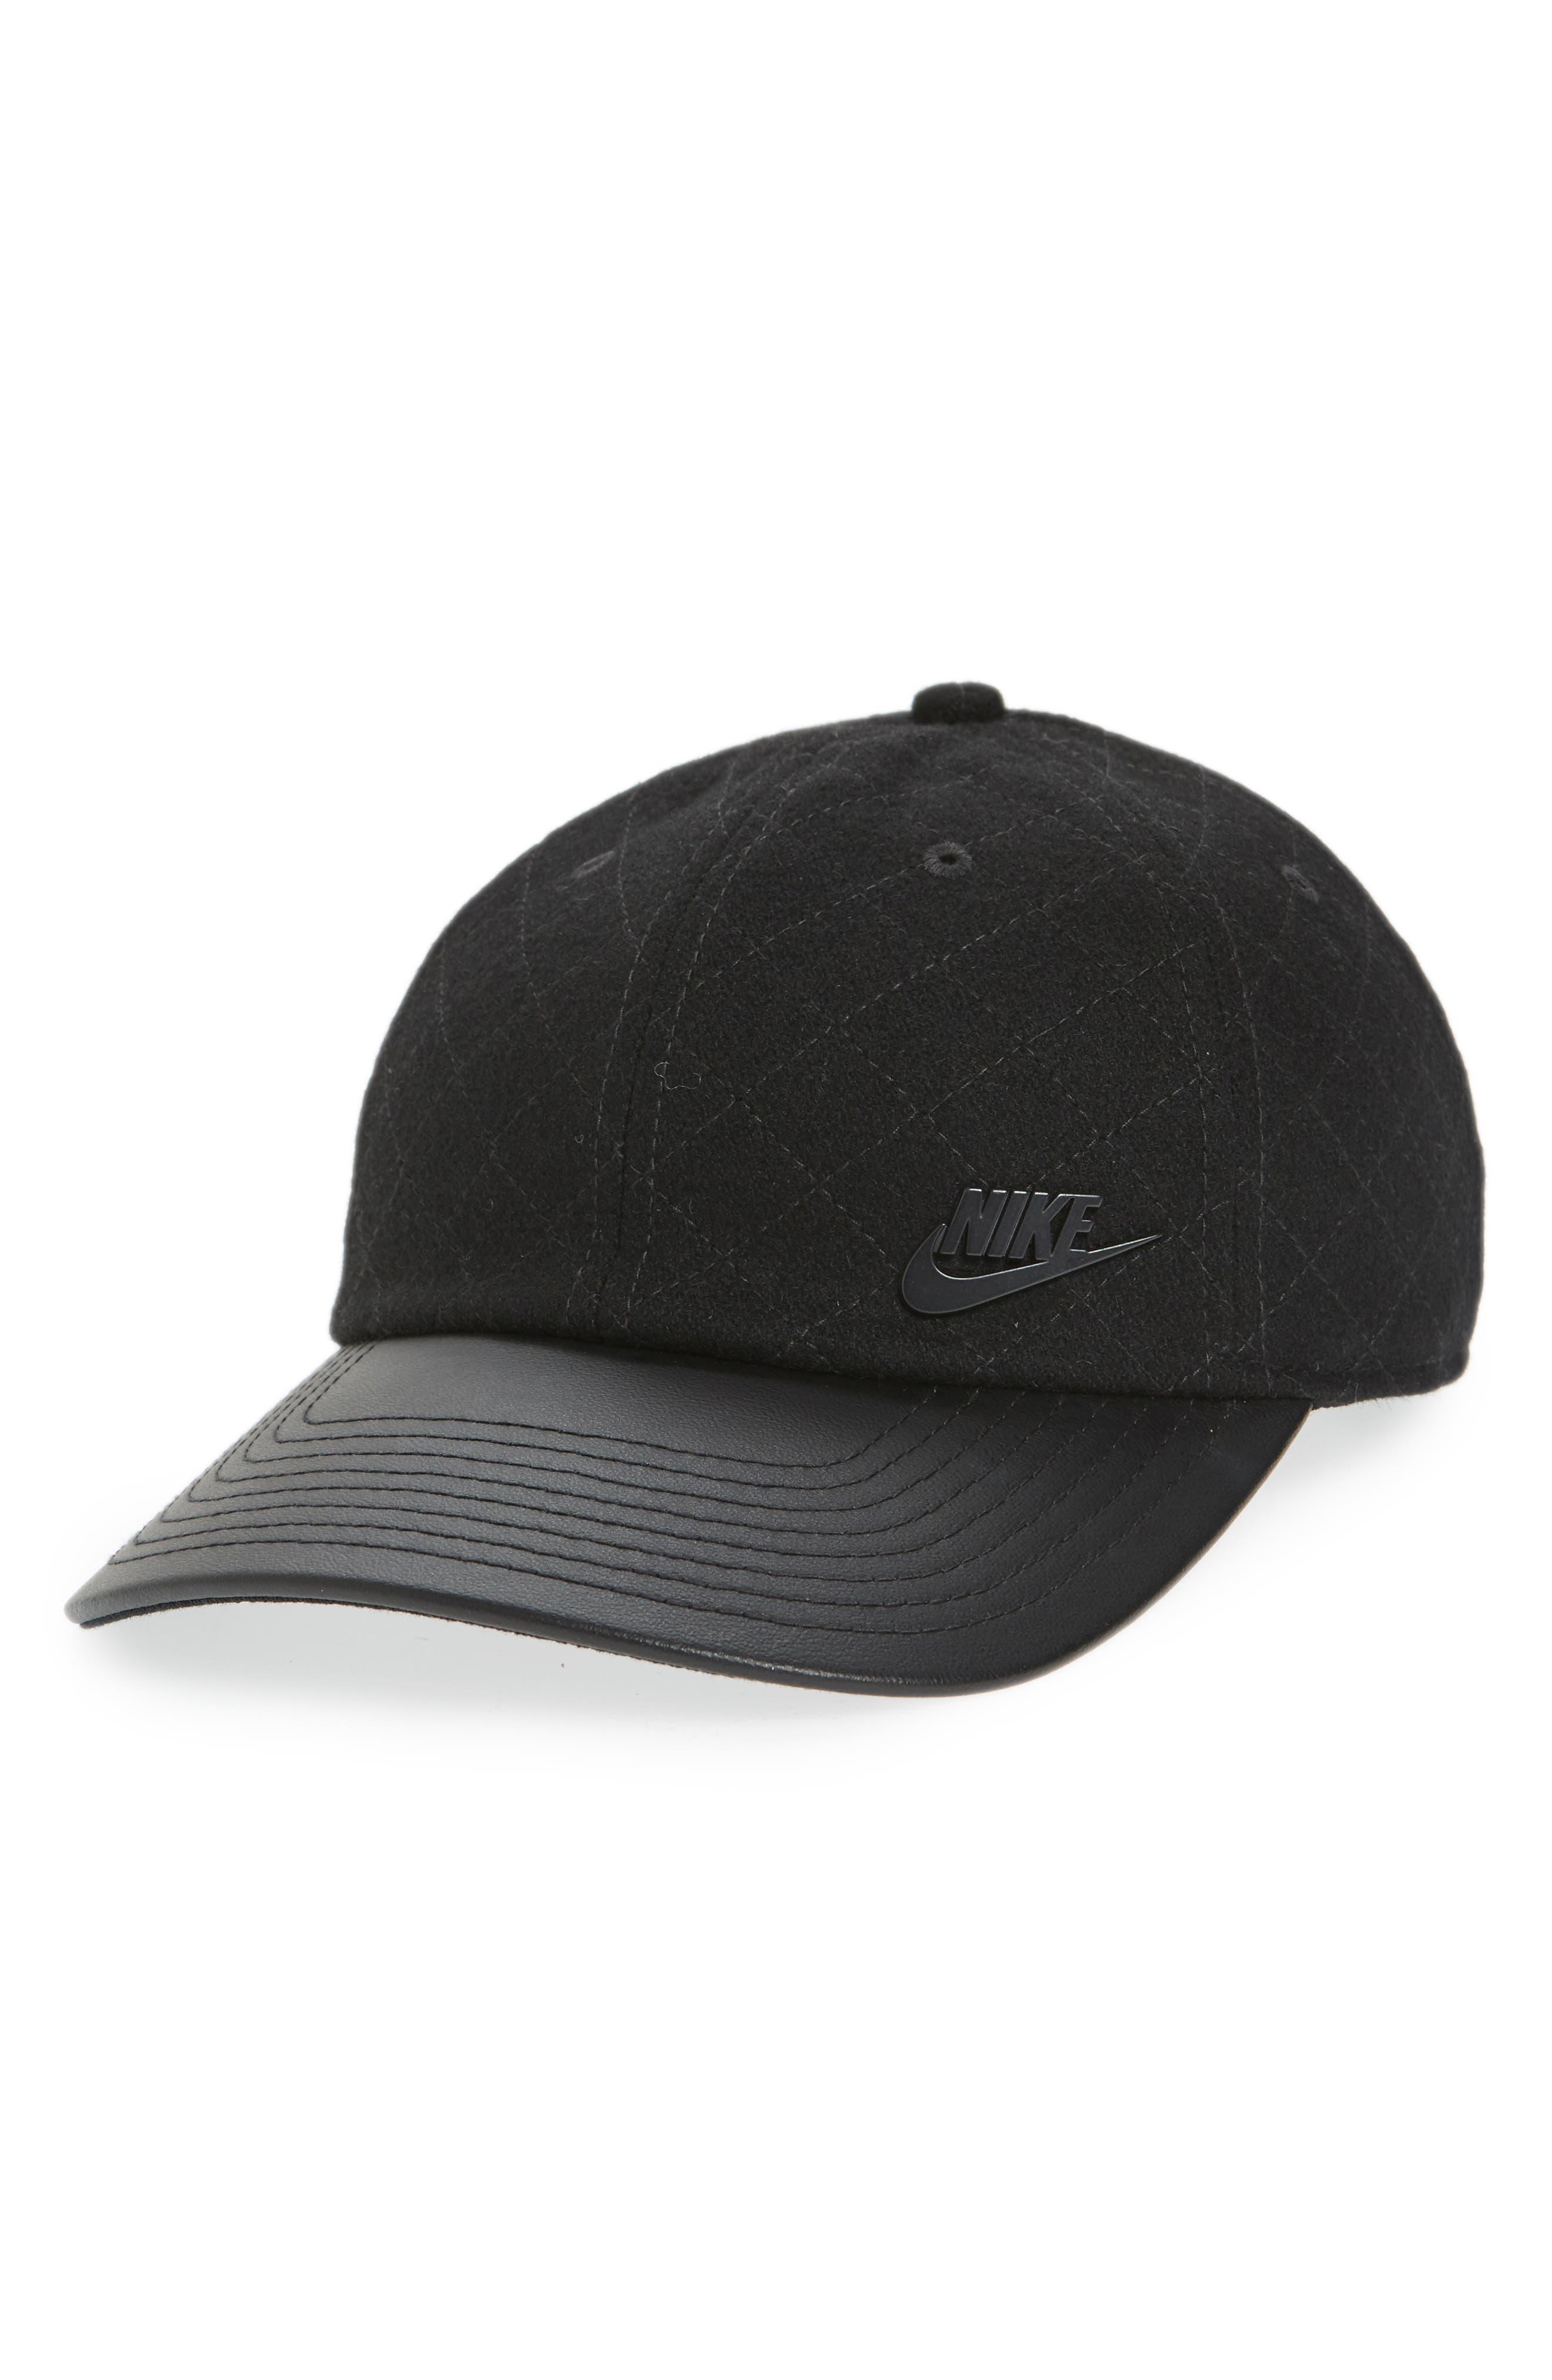 nike womans hat